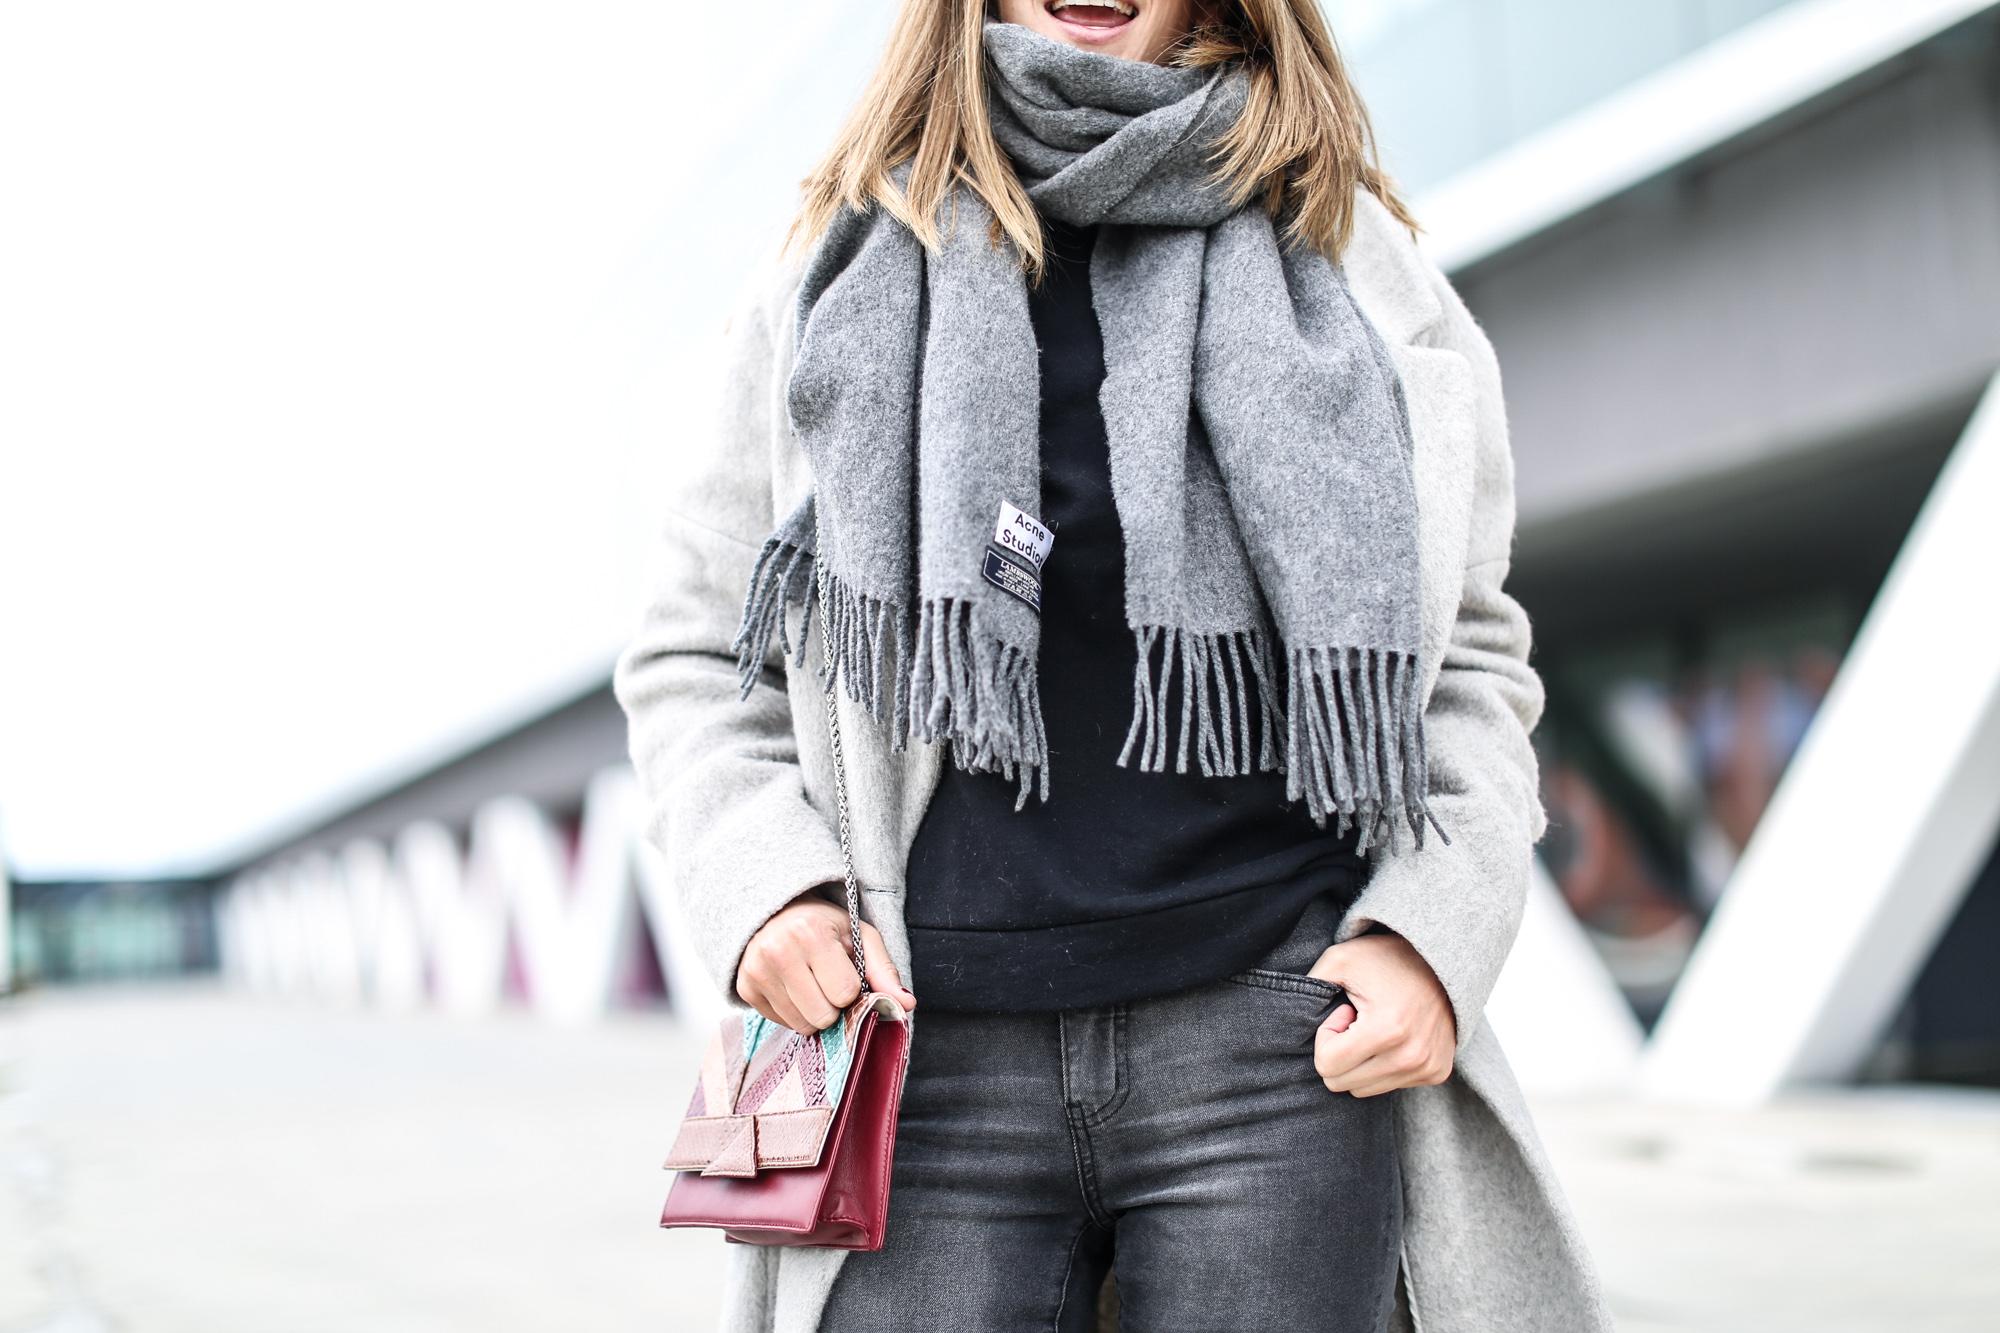 Clochet_streetstyle_fashionblogger_abrigolargogrislanamango_isabelmarantdicker_sudaderalazoclaudiepierlot-6